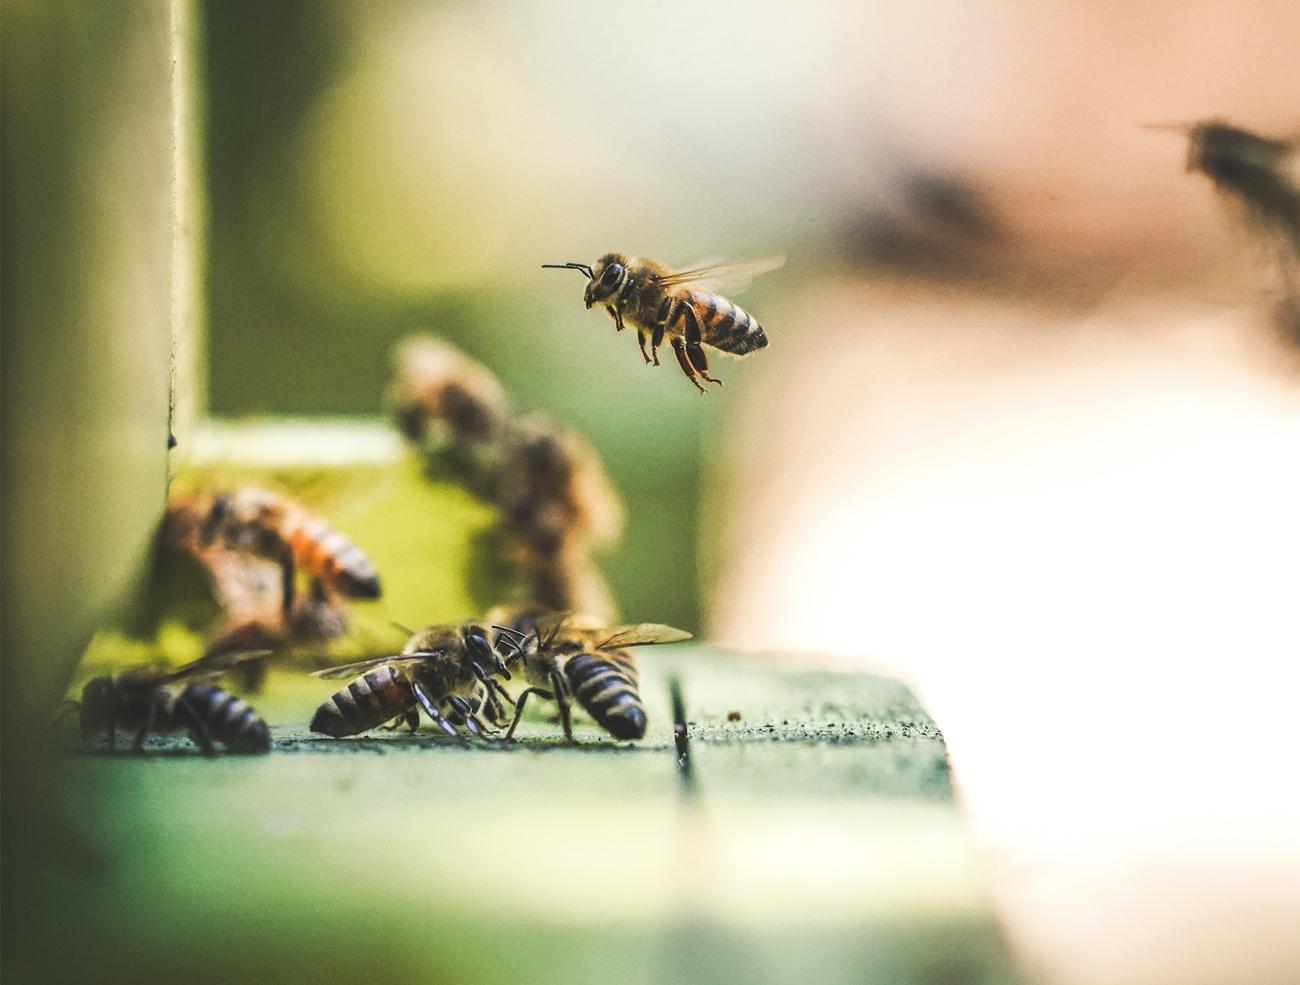 soin abeilles apiculteur oise